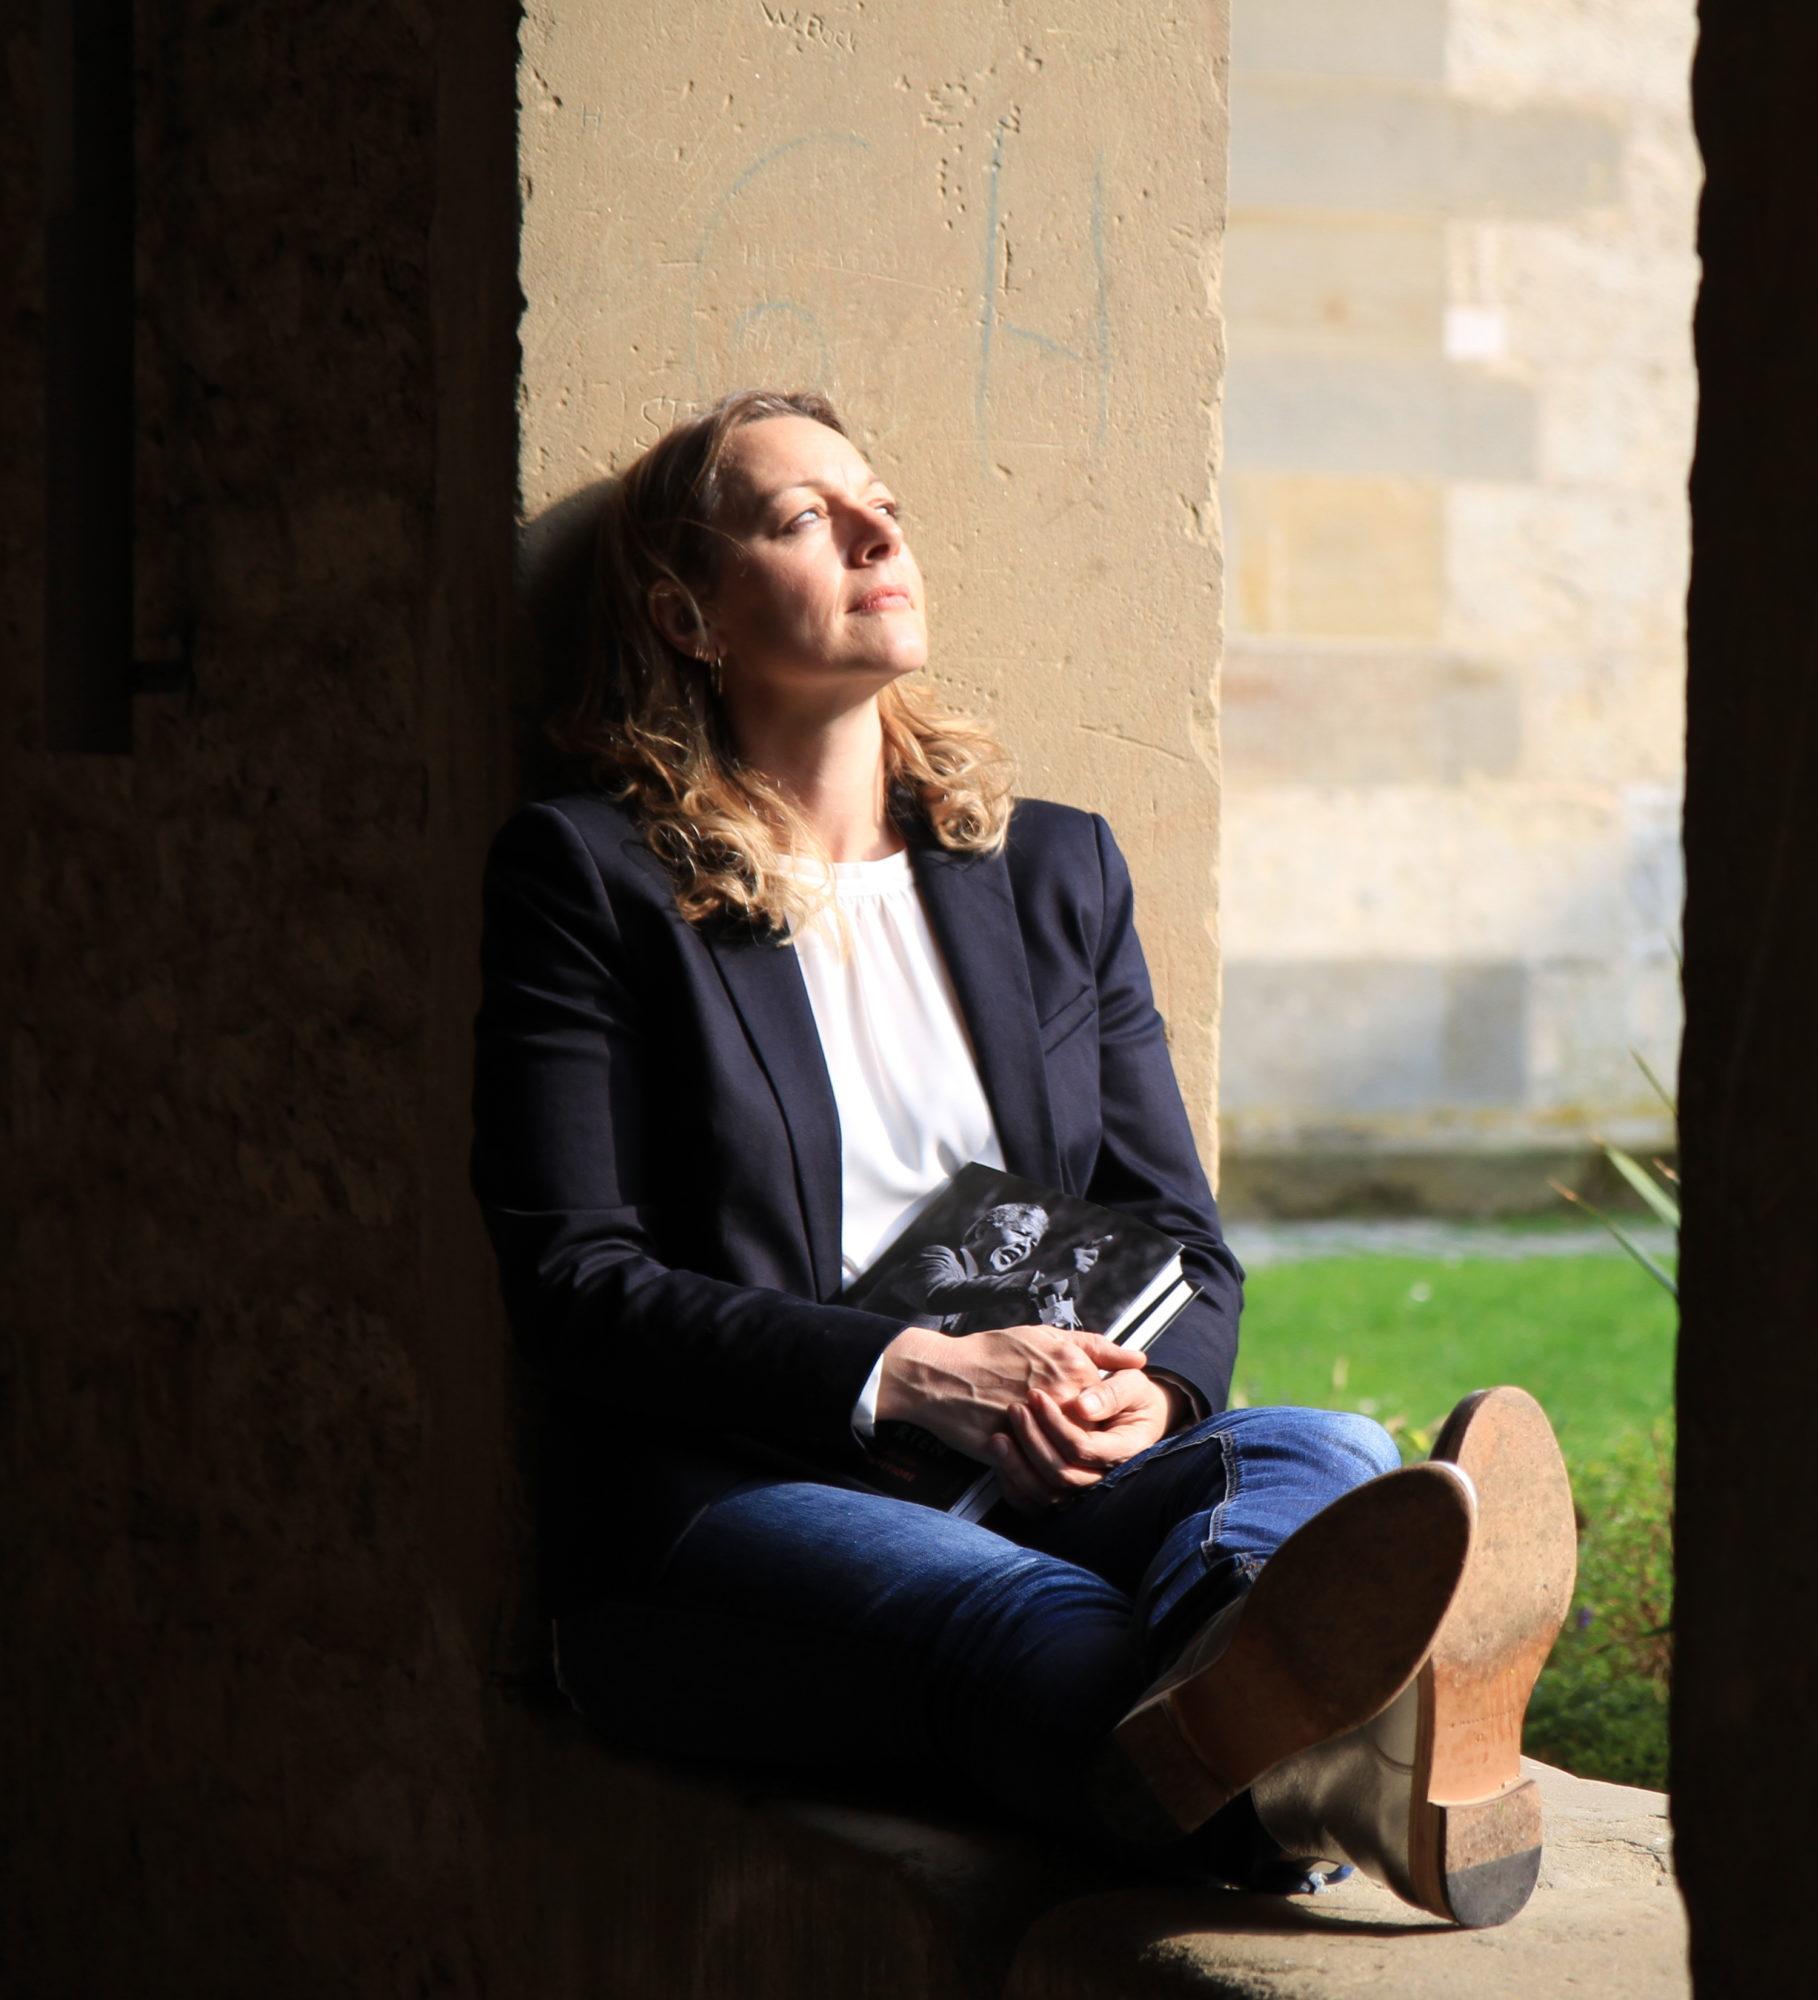 Martina Maria Reichert: Coach, Künstlerin, Friedensaktivistin  - WER MICH INSPIRIERT